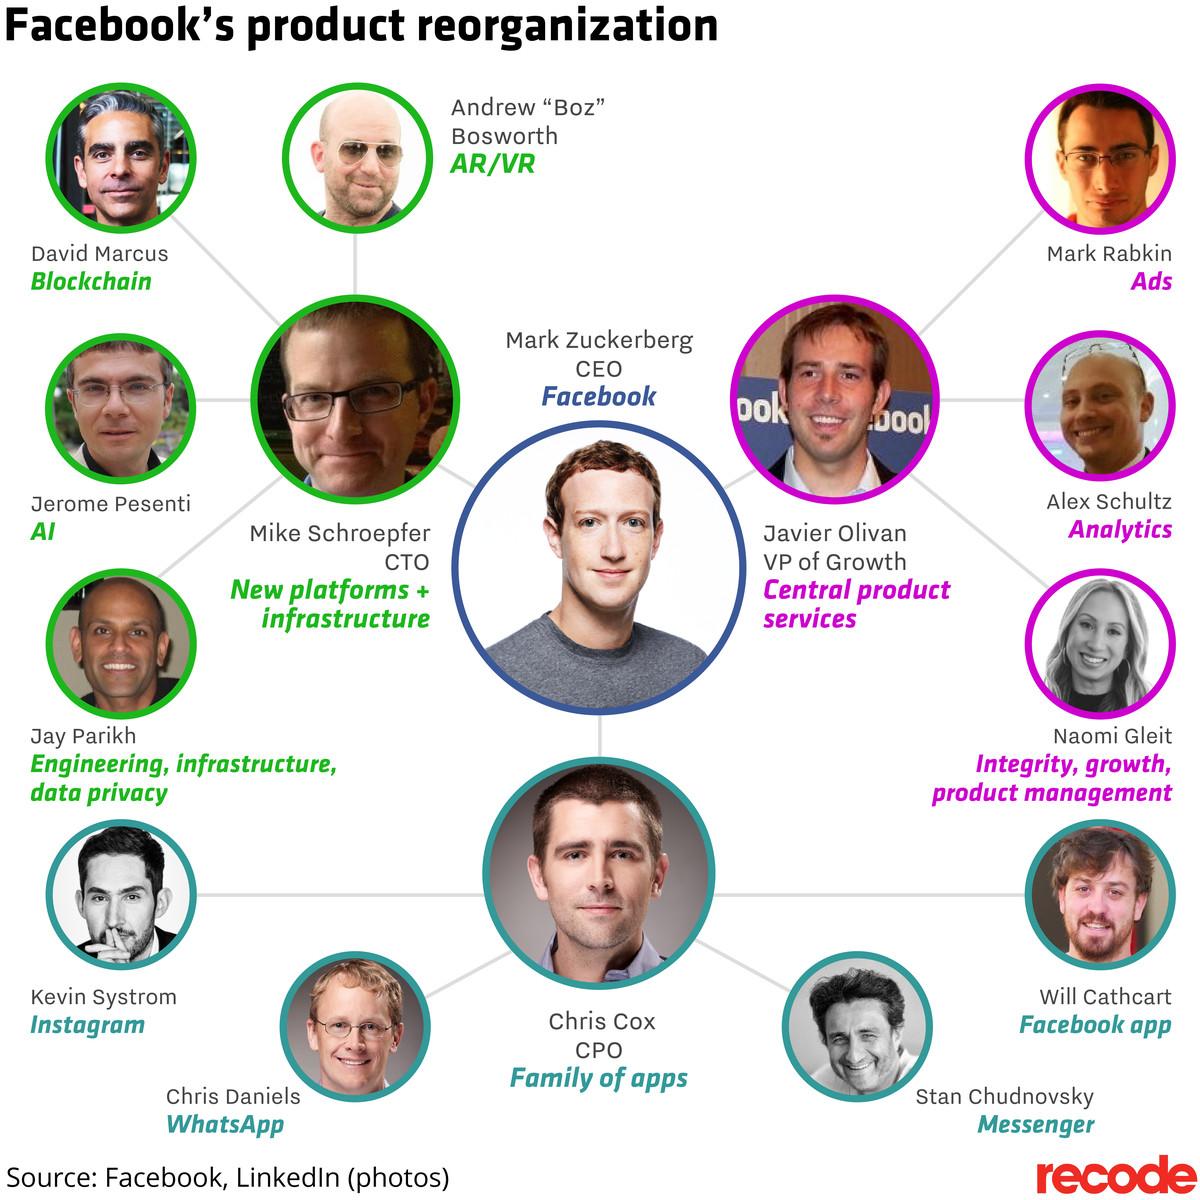 Facebook product reorganization